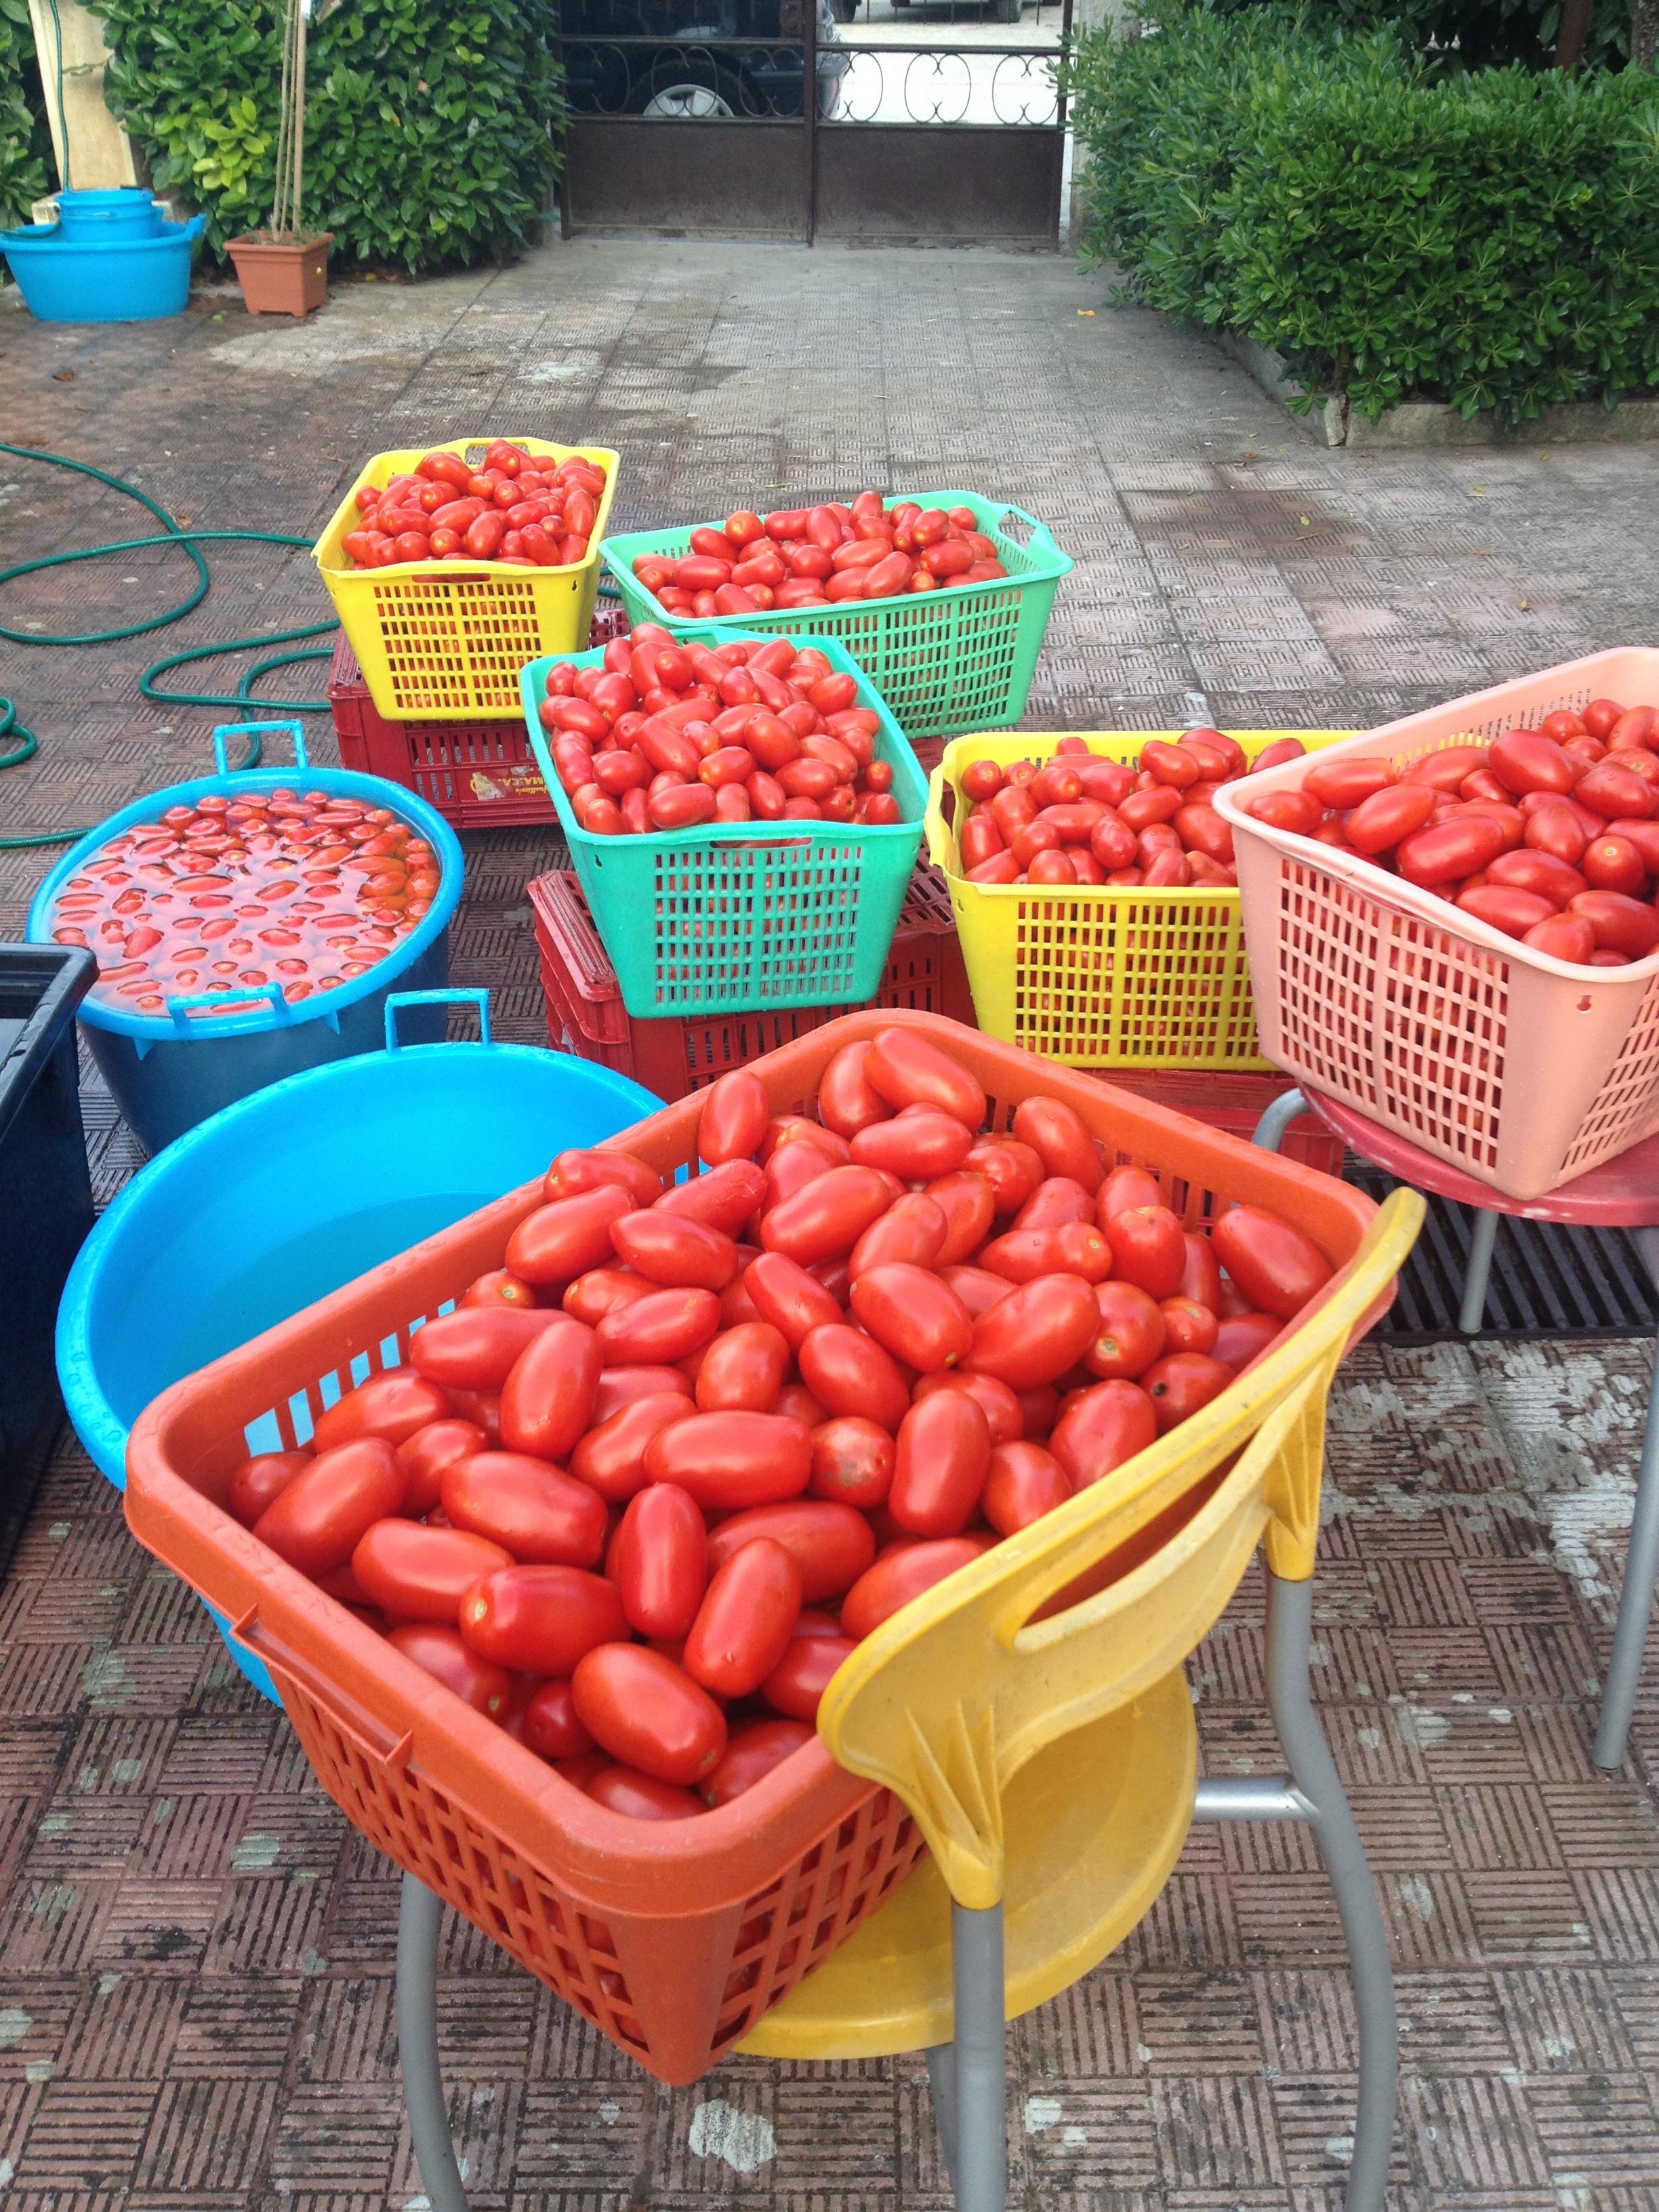 conserva di pomodoro casalinga